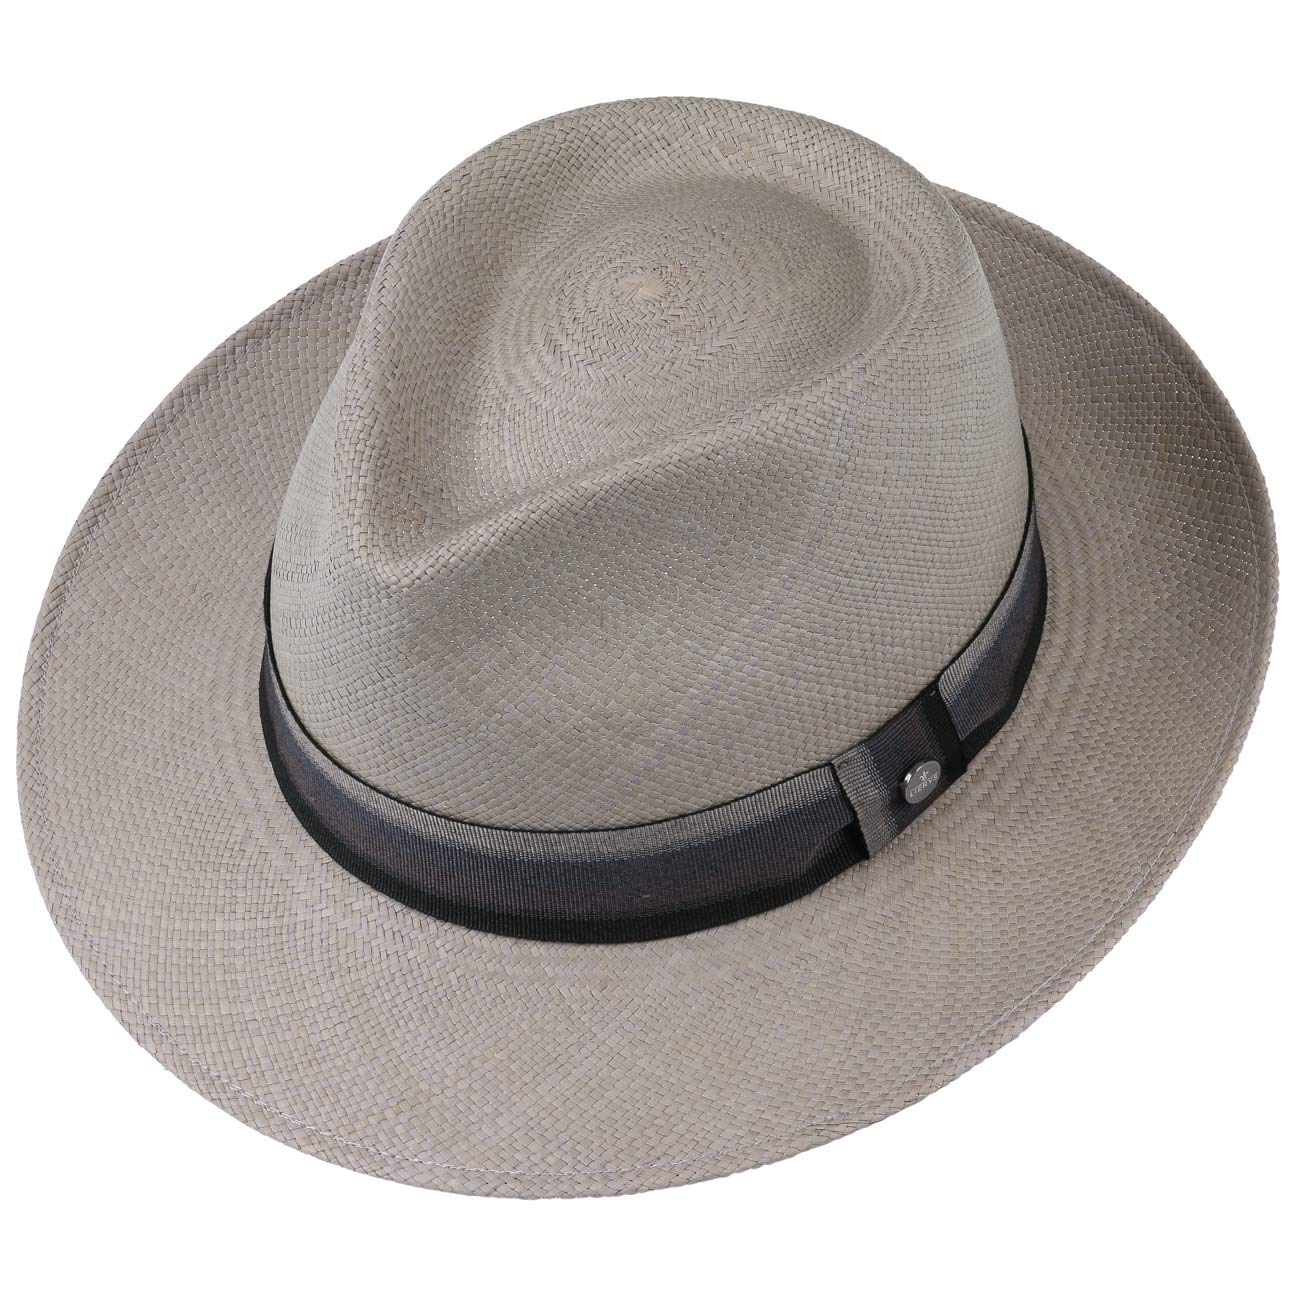 Made in Ecuador Estivo Paglia da Sole con Nastro Grosgrain Lierys Cappello Panama Grey Paradise Bogart Uomo Grosgrain Primavera//Estate